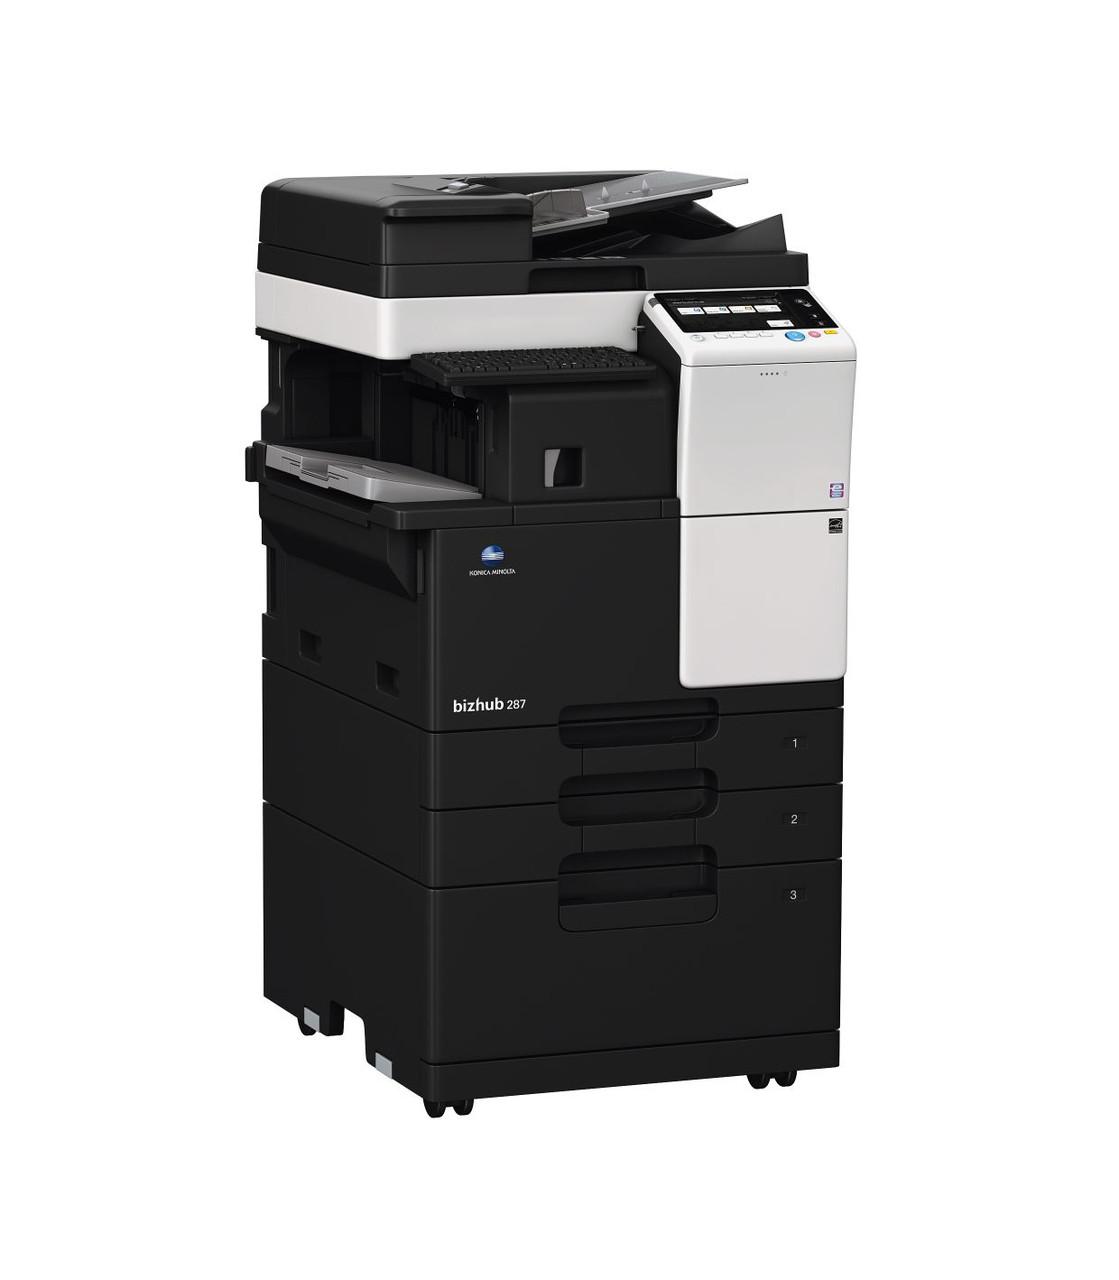 Konica Minolta bizhub 287, монохромное МФУ, А3, 28 стр./мин, копир, принтер, сканер, дуплекс, факс.